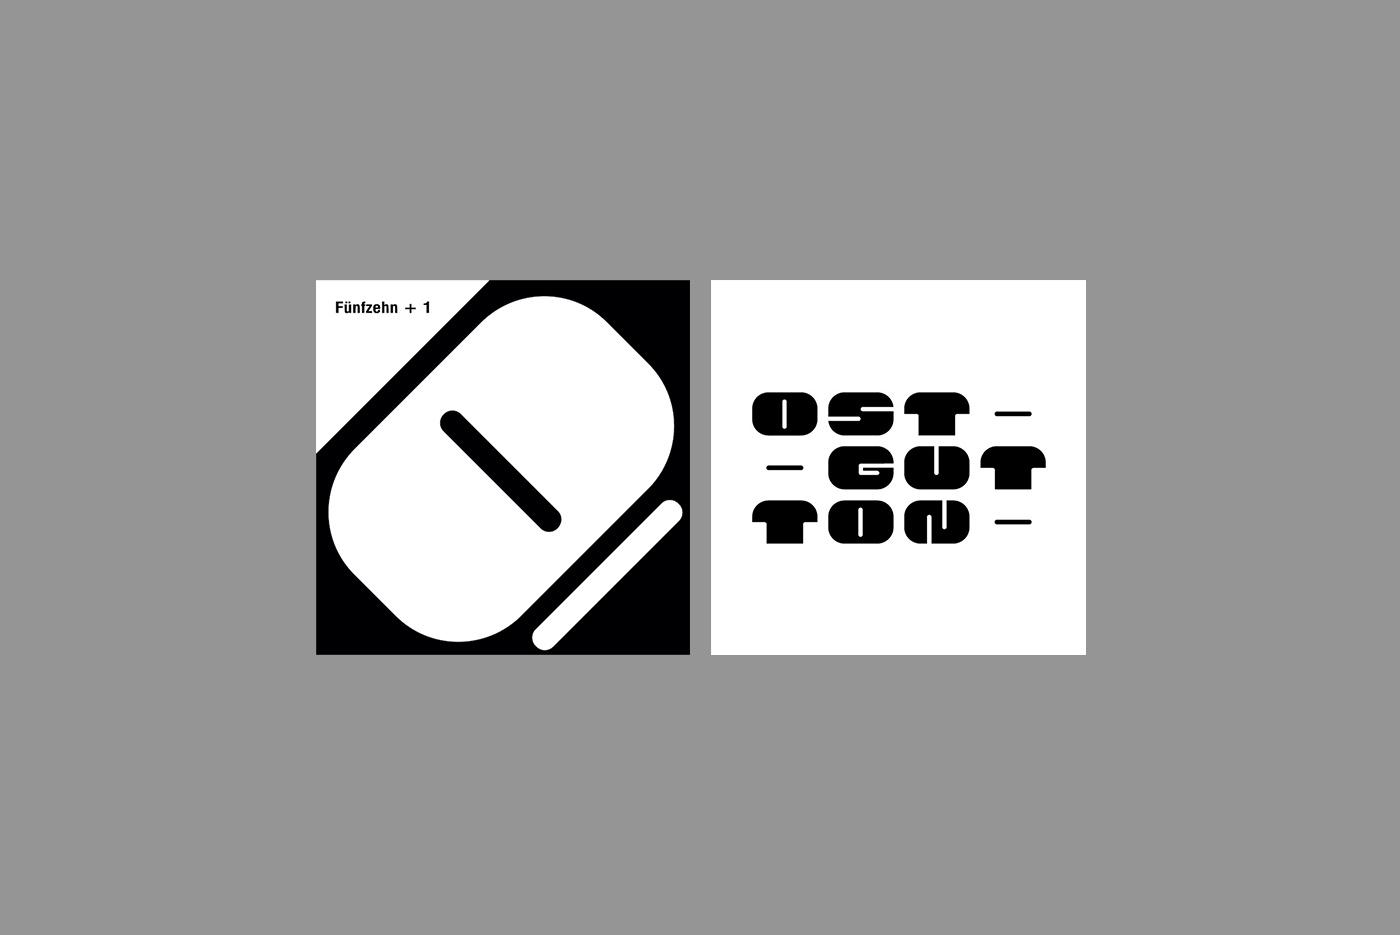 Ostgut Ton announces its 16th anniversary compilation